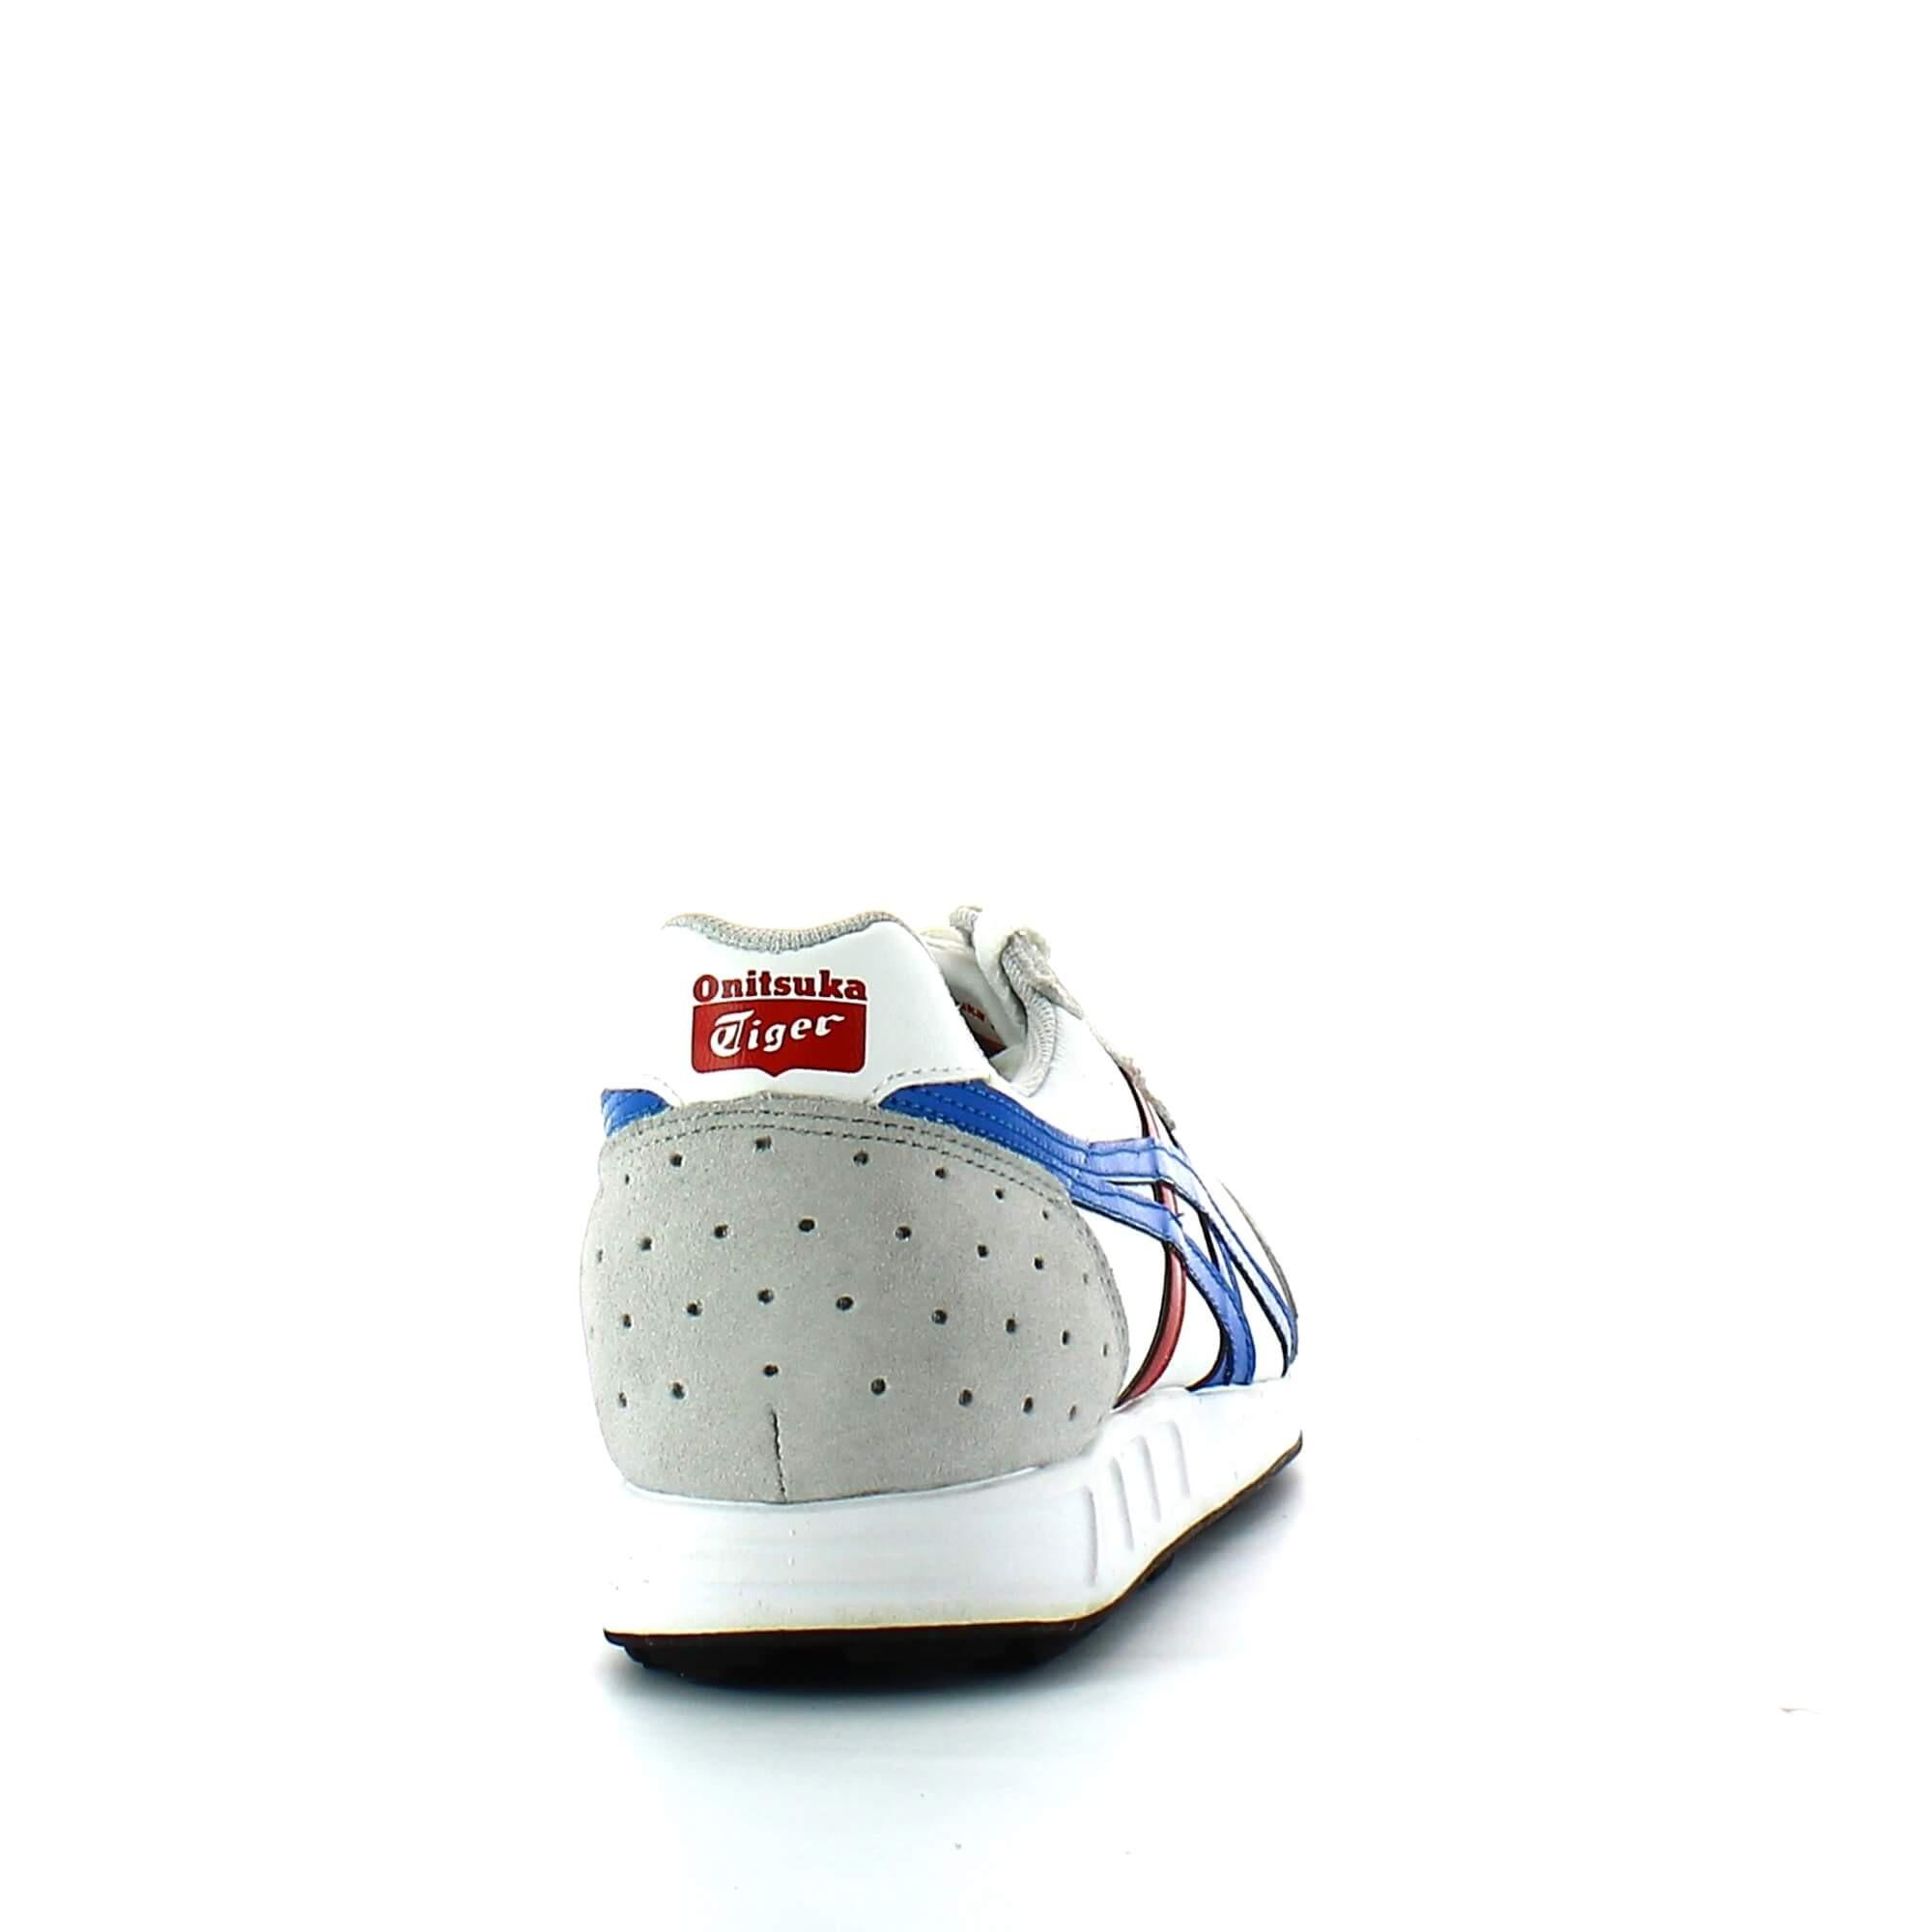 Zapatillas Asics Onitsuka Tiger T-Stormer blanco azul hombre - Deportes Moya 44141399adf54